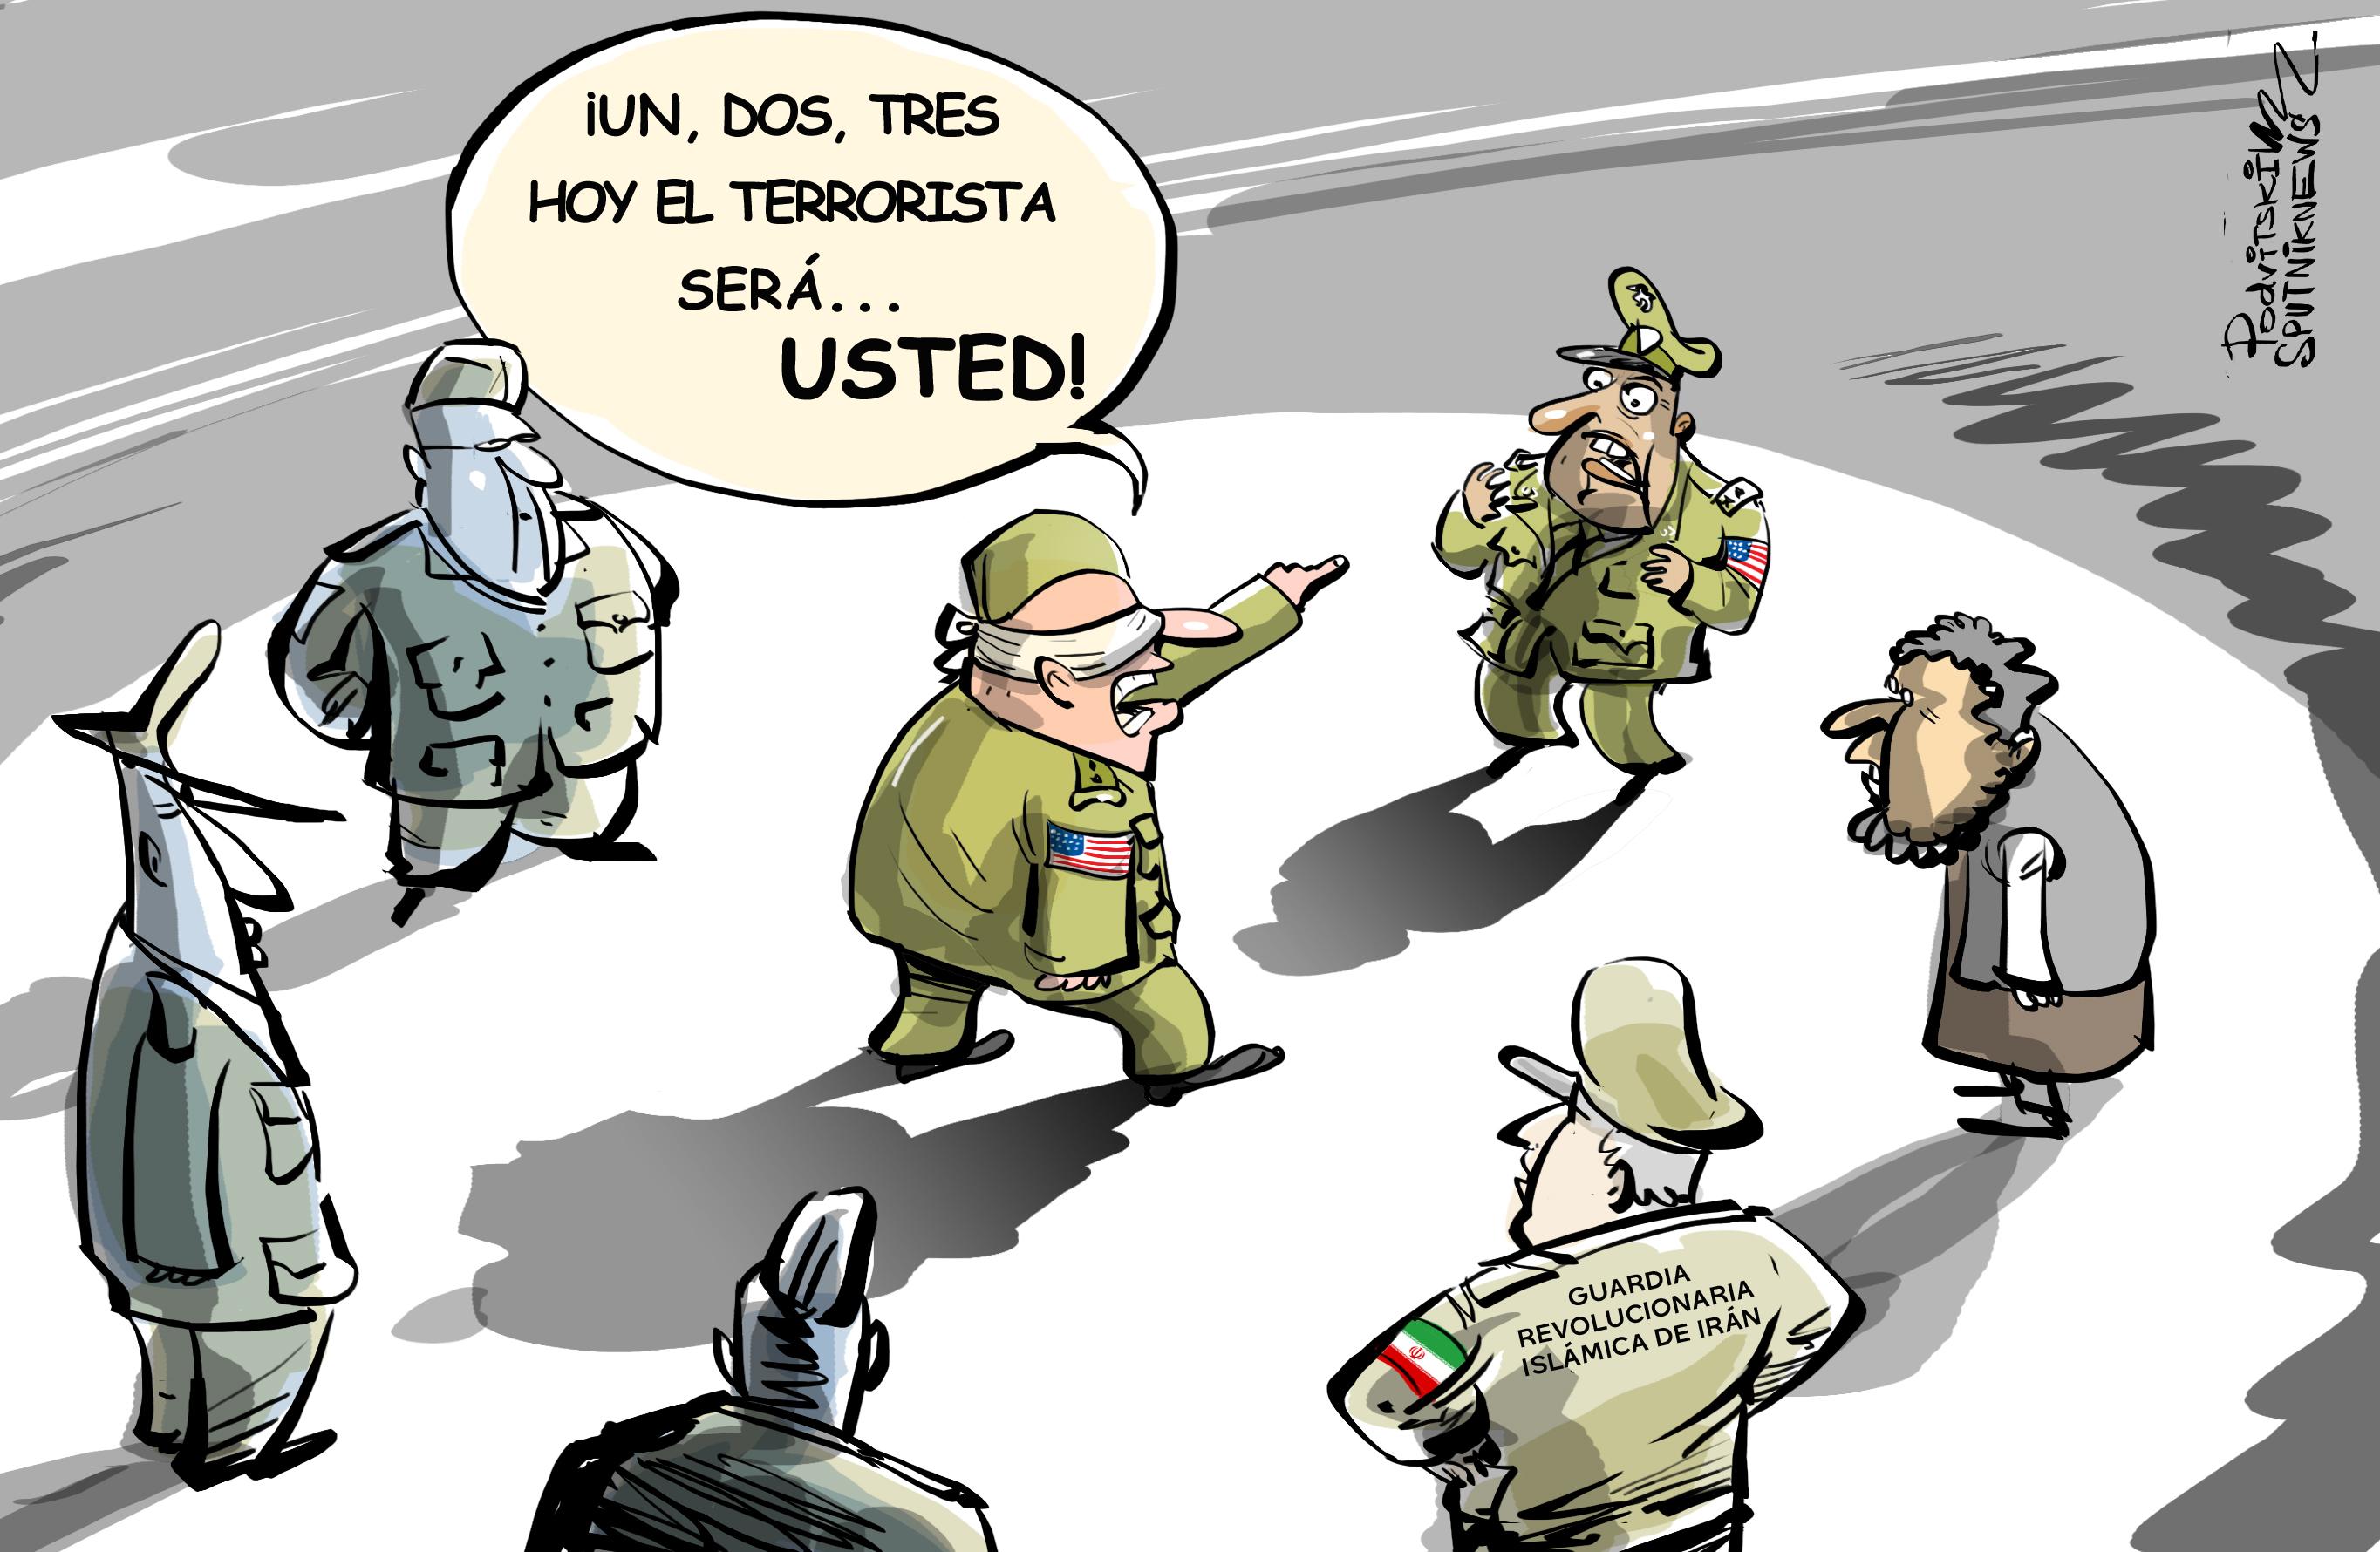 Mando Central de EEUU, ¿un grupo terrorista?